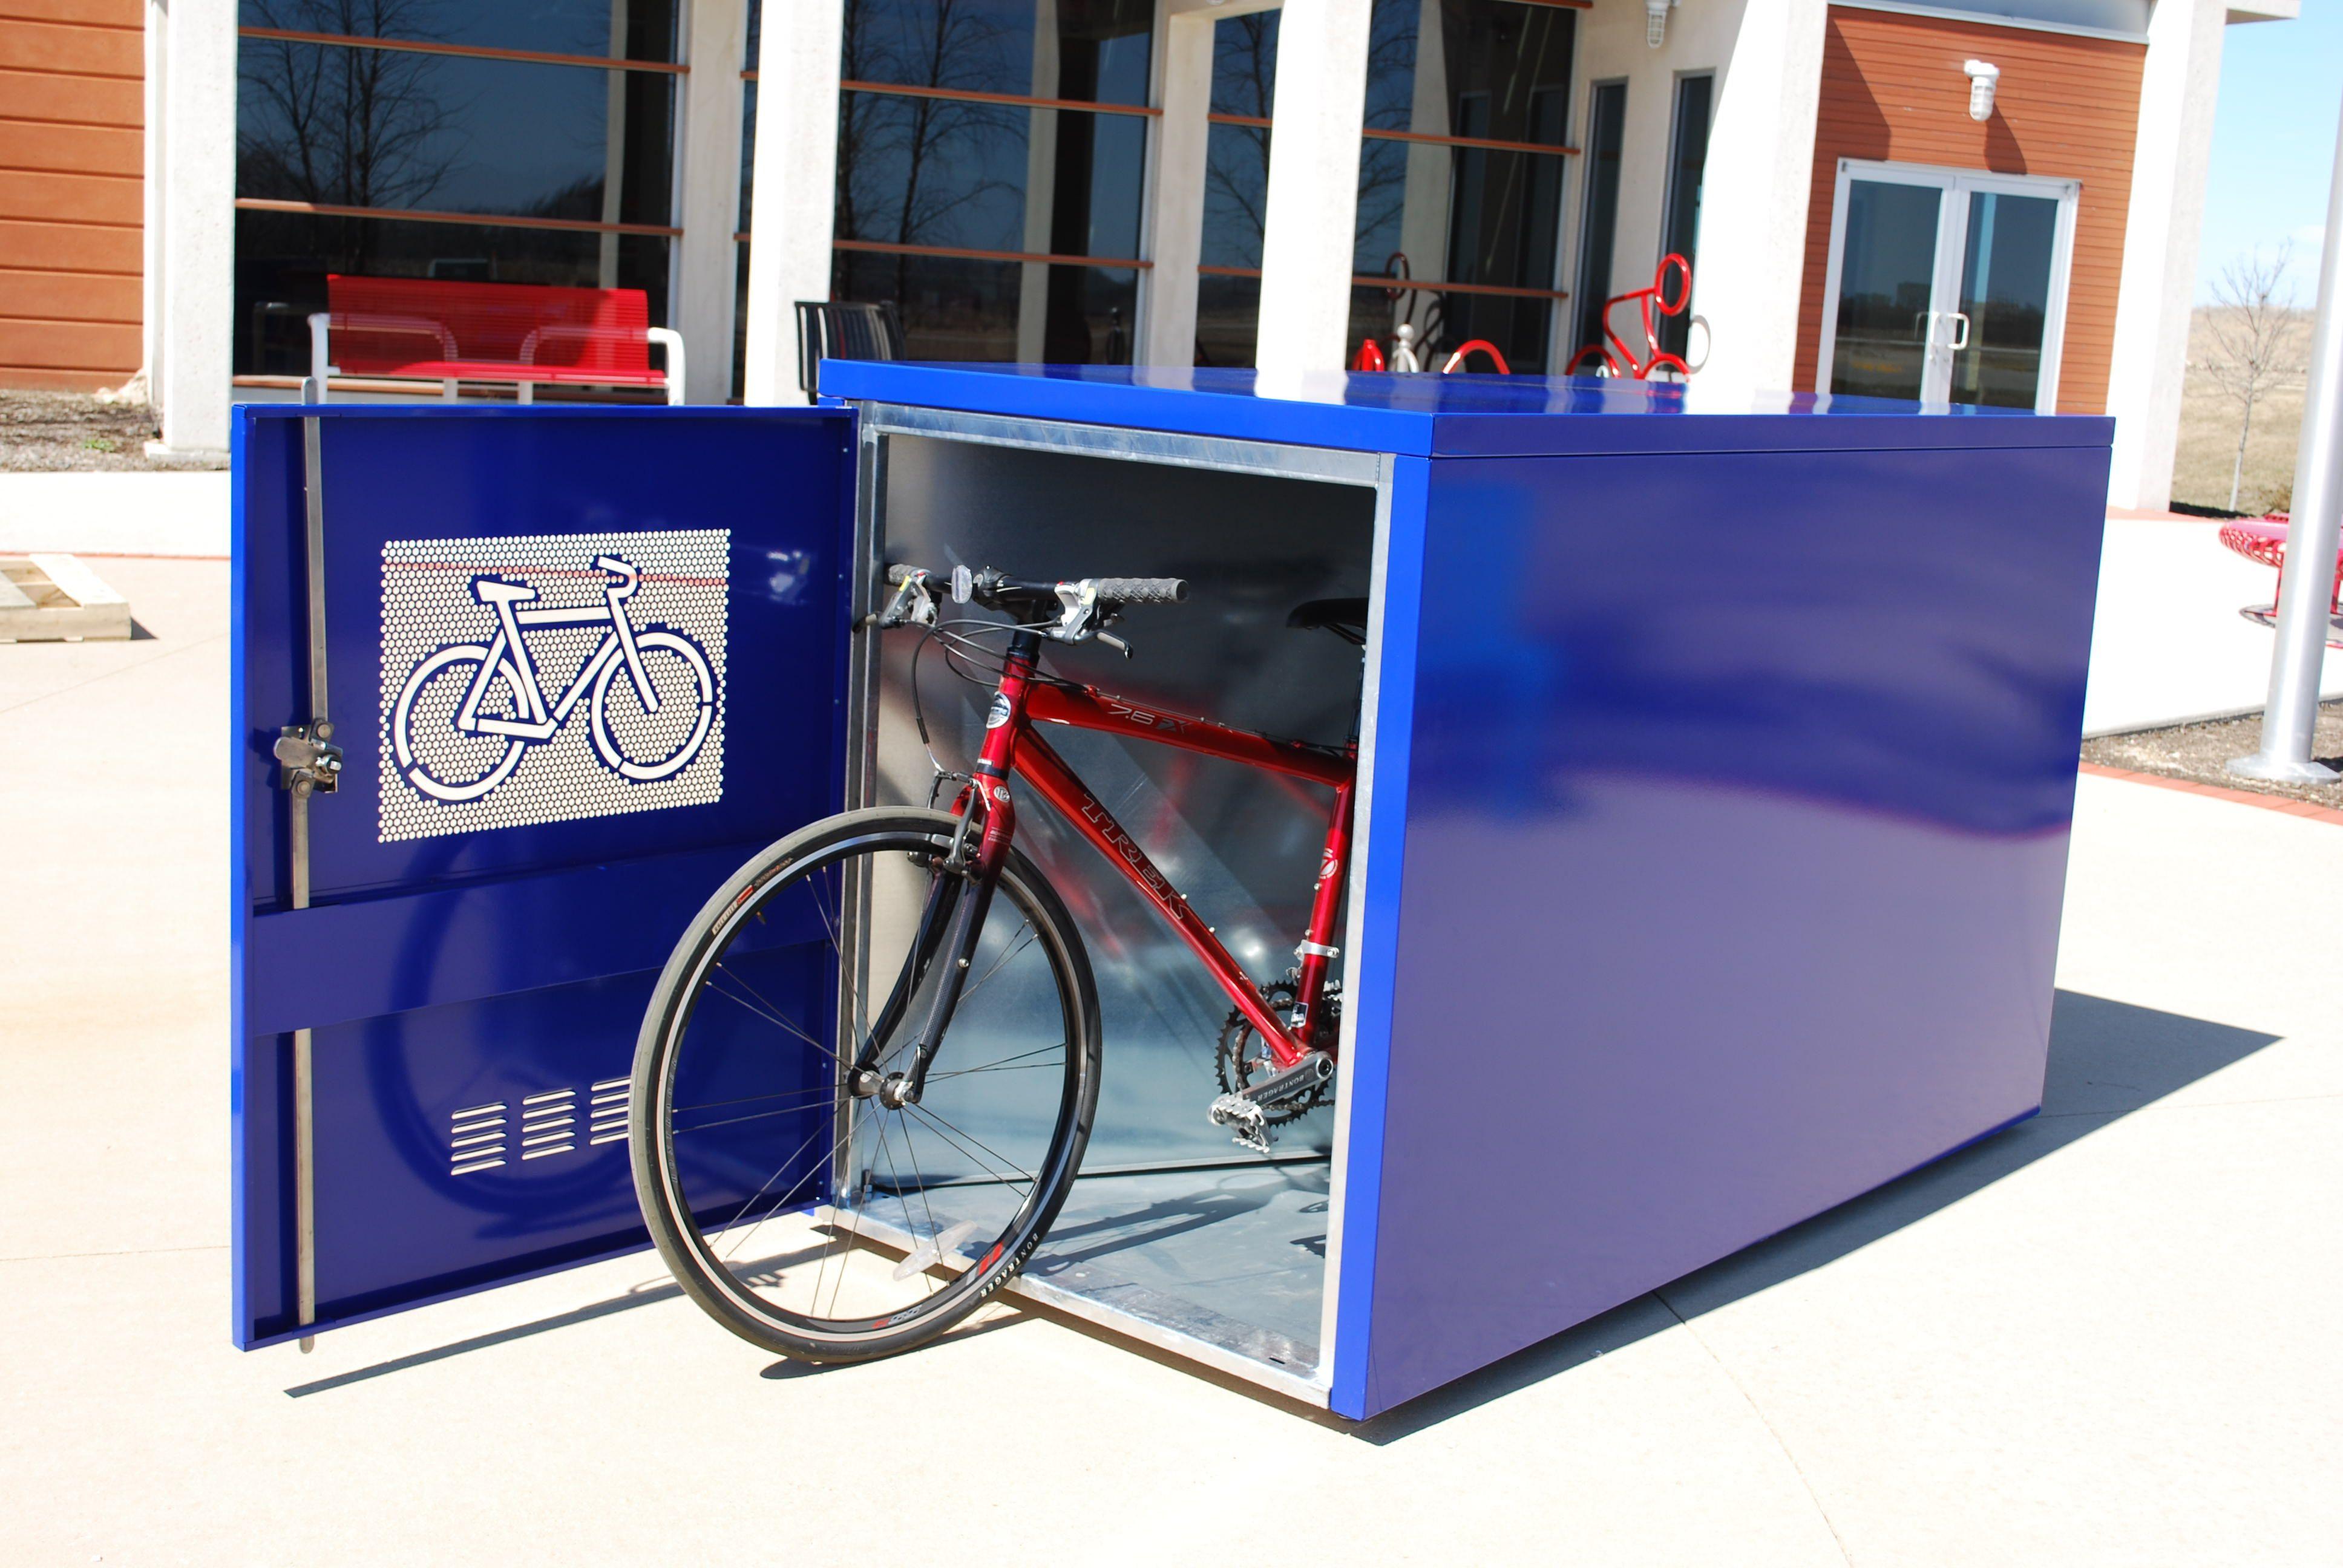 Madrax Madlocker Bike Locker A Great And Durable Way To Store